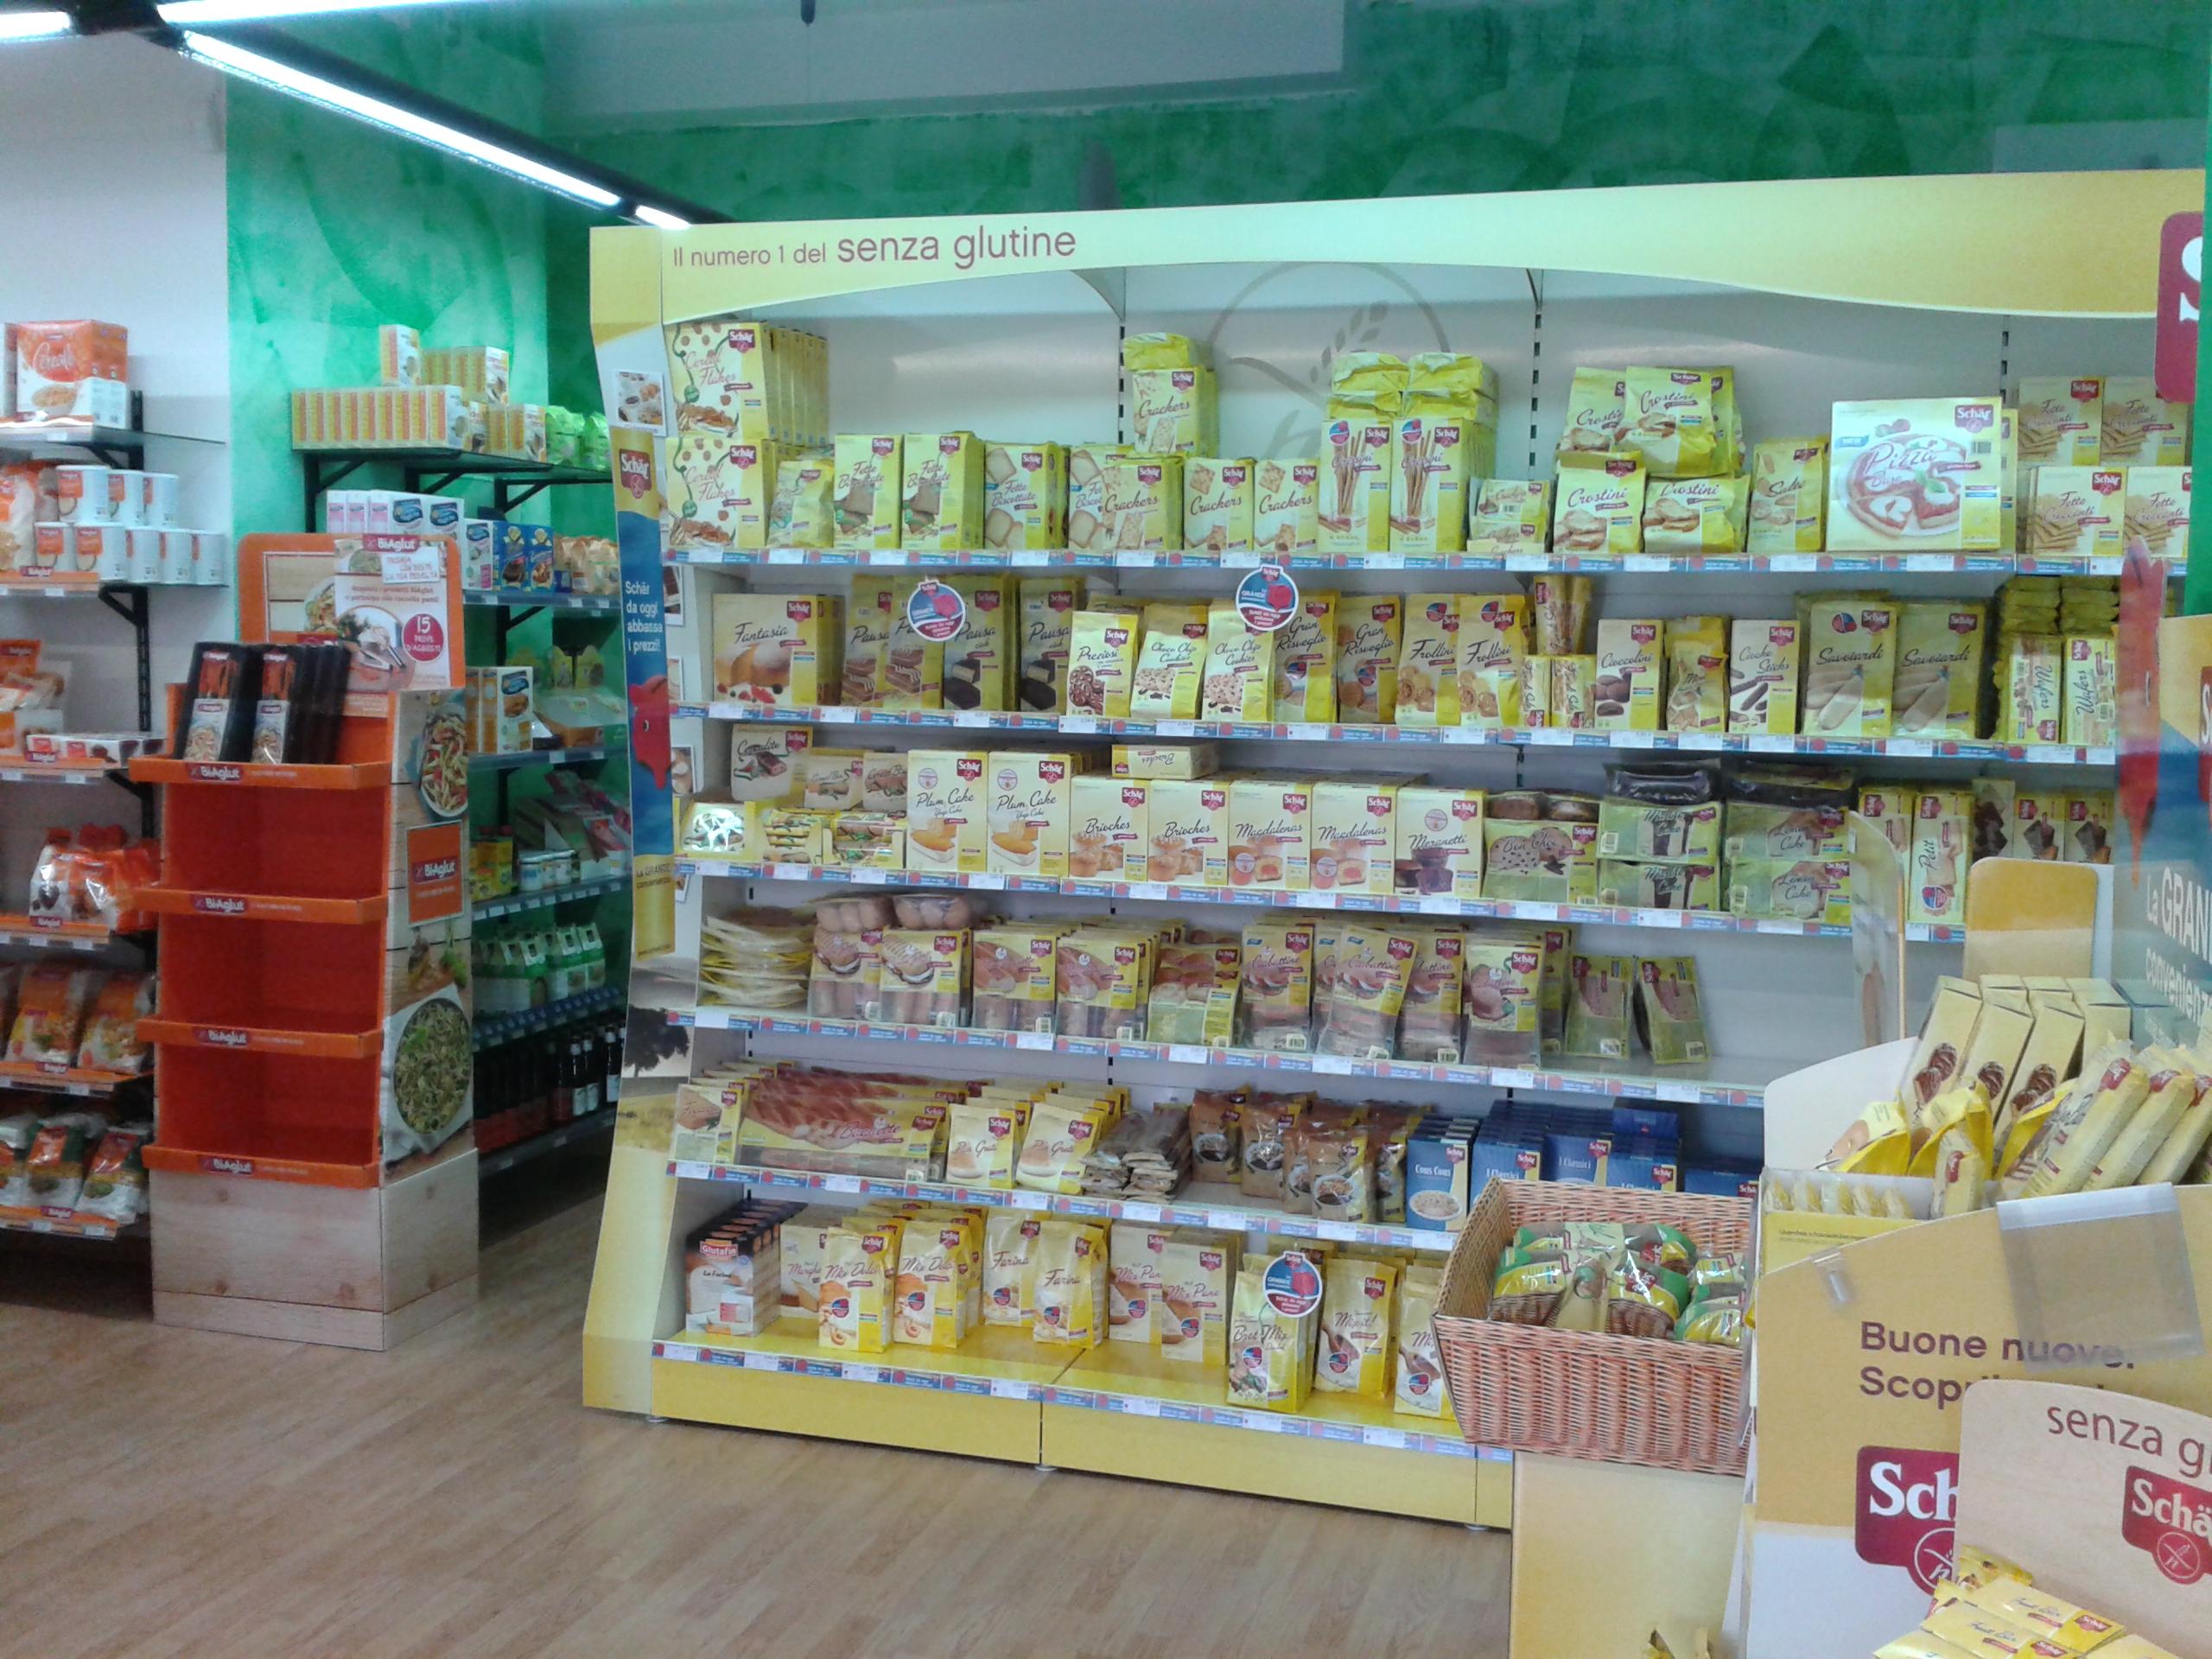 Celiachia Food Prodotti Senza Glutine 03